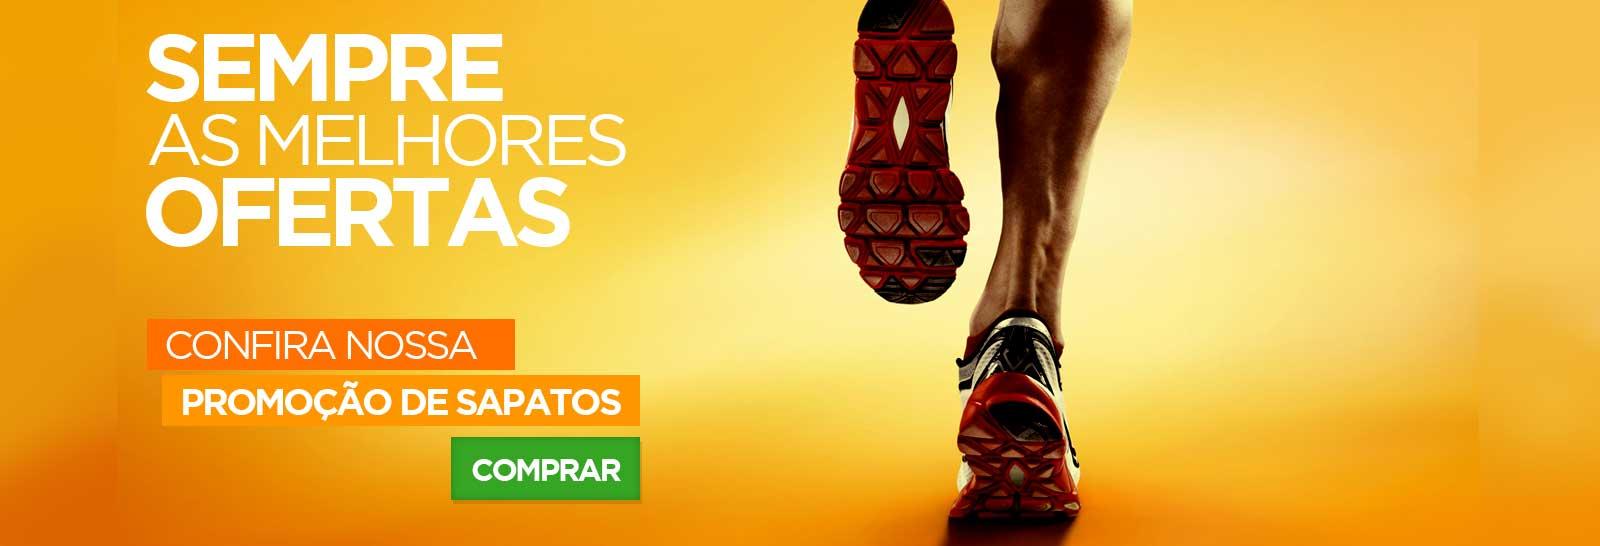 965d2498b28 Naná Sports